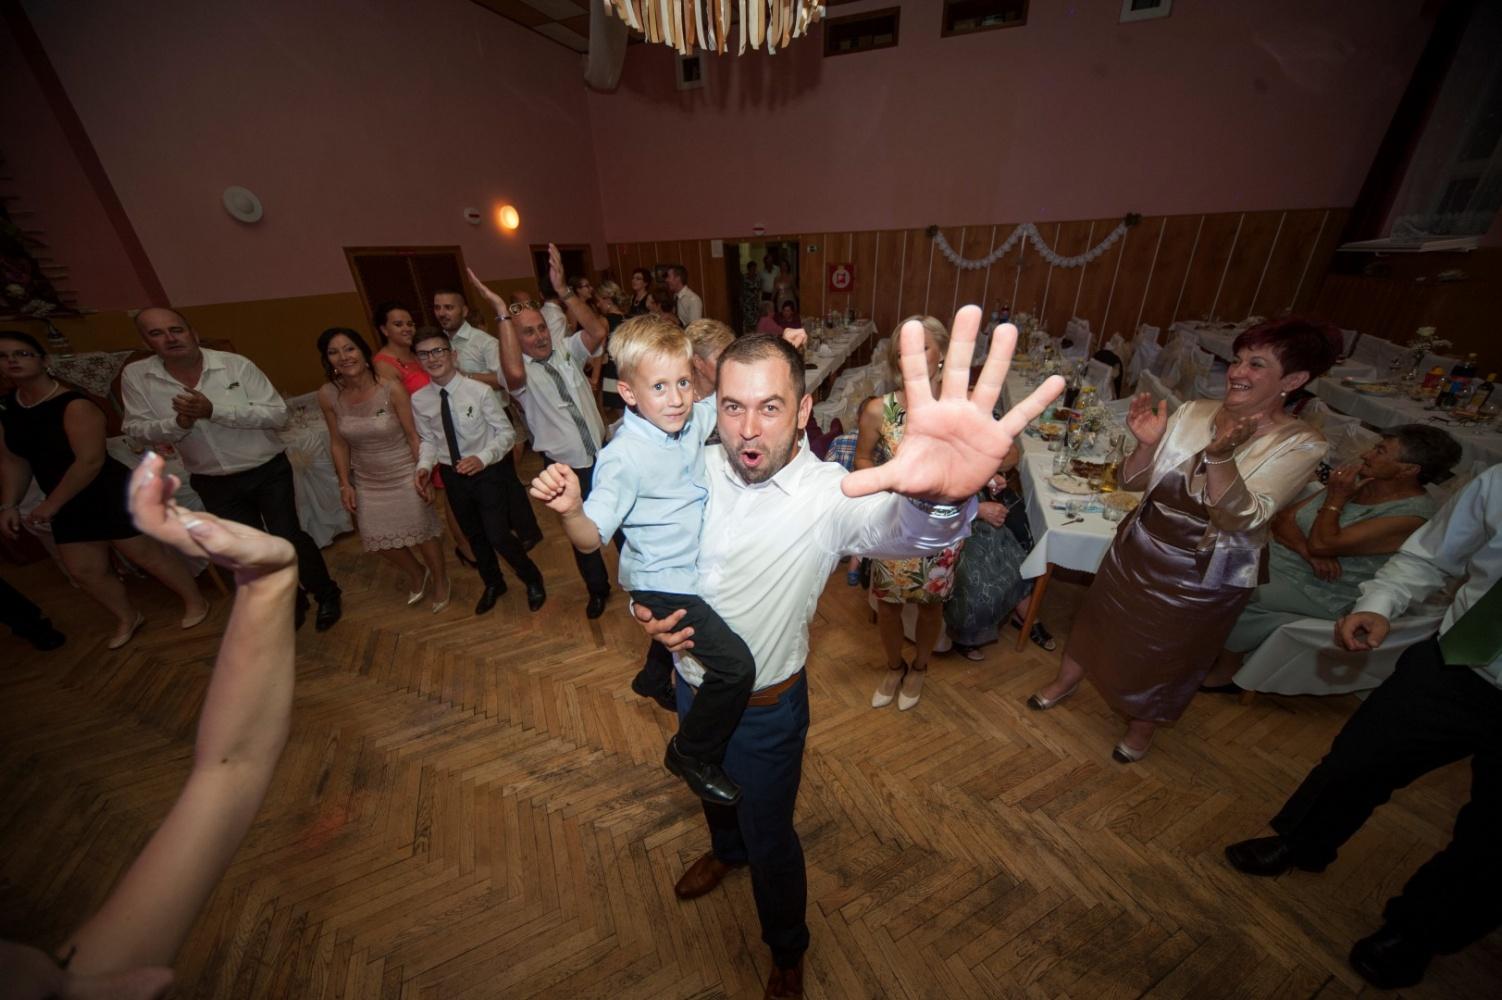 http://www.fotoz.sk/images/gallery-21/normal/svadobne-fotenie_eskuvoi-fotos_270.jpg